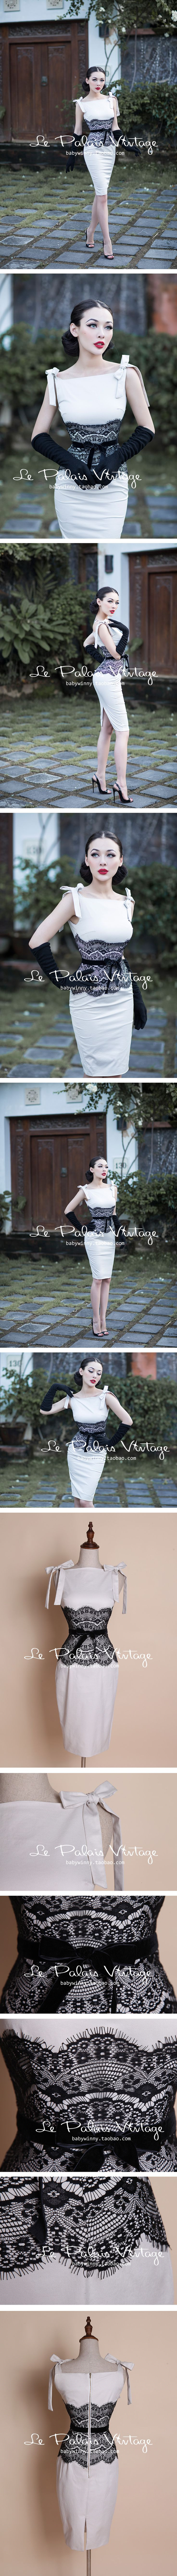 le palais vintage優雅複古淡米色蕾絲拼接顯瘦修身連衣裙 0.45-淘寶台灣,萬能的淘寶